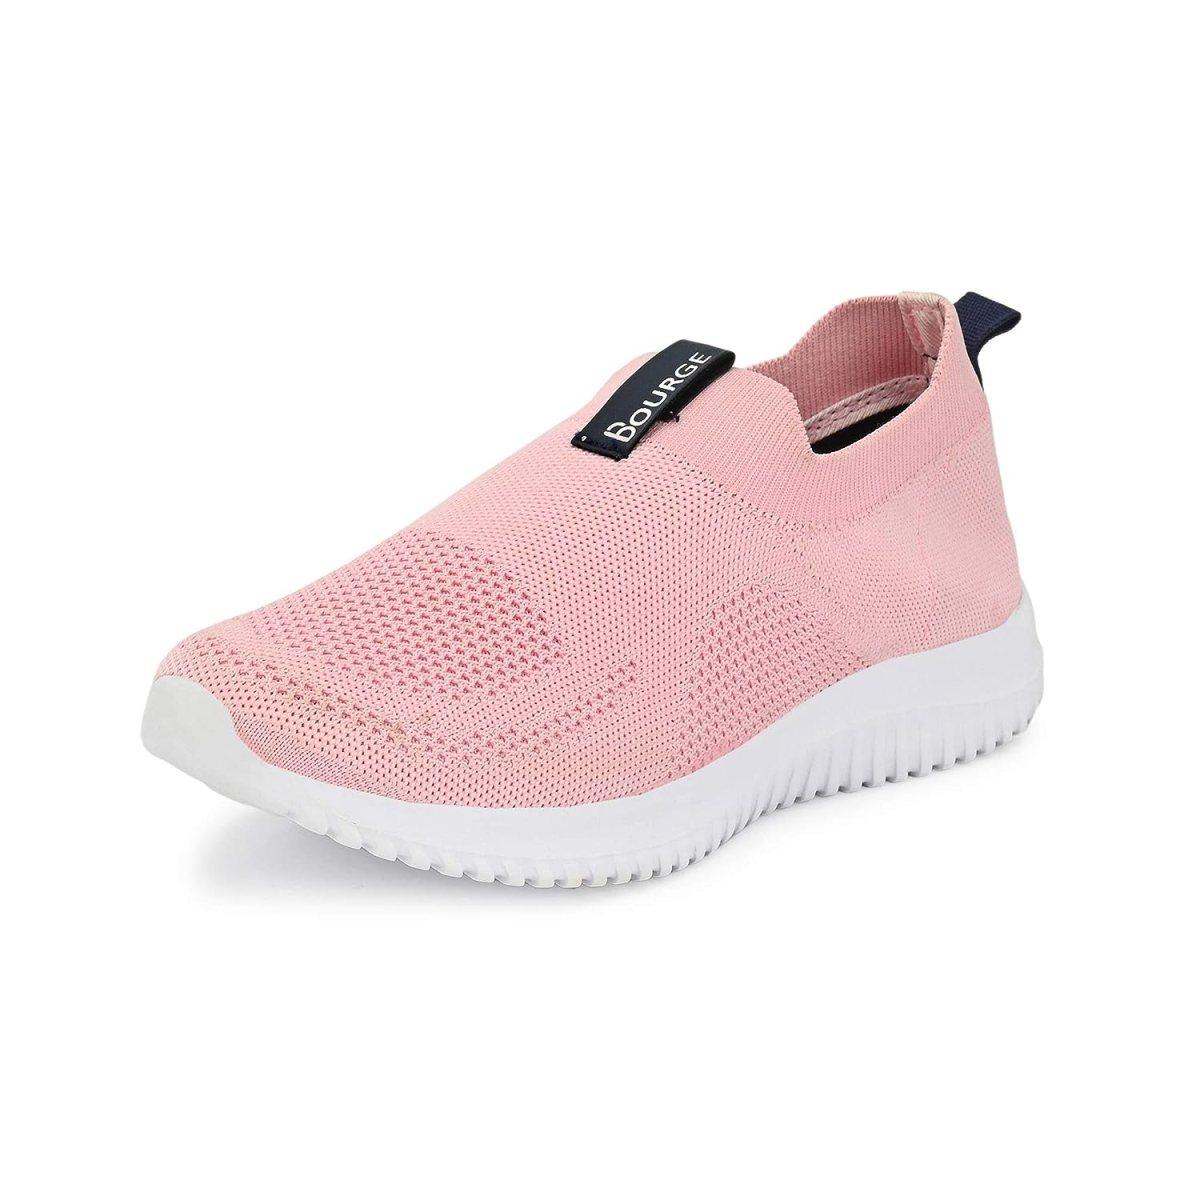 Bourge Women's Micam-102 Running Shoes